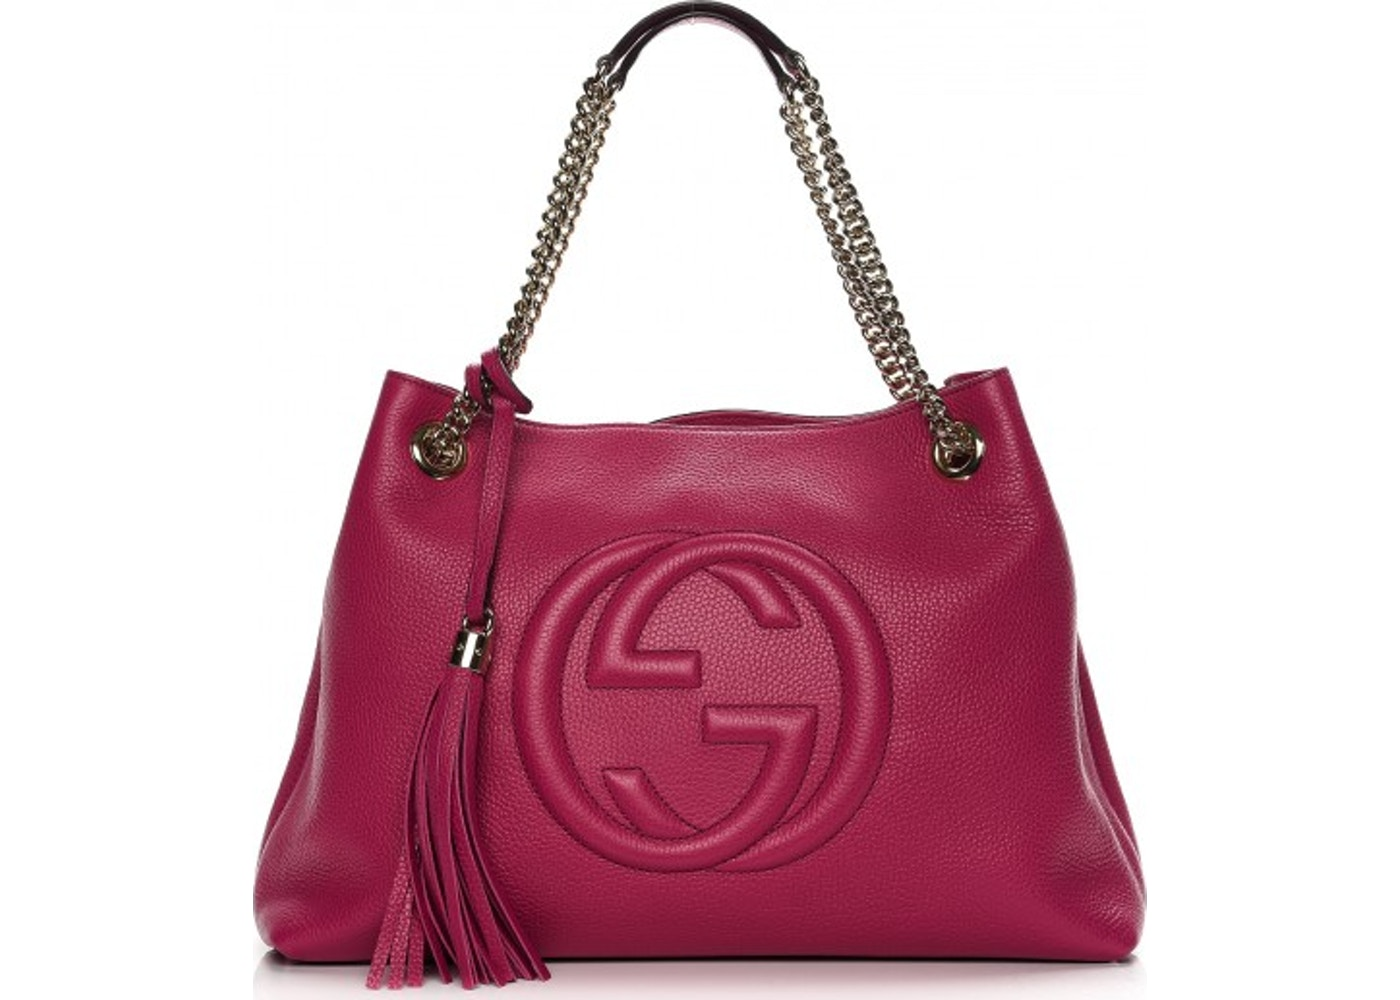 e3f51dbc01e Gucci Soho Chain Shoulder Bag Medium Dark Pink. Medium Dark Pink